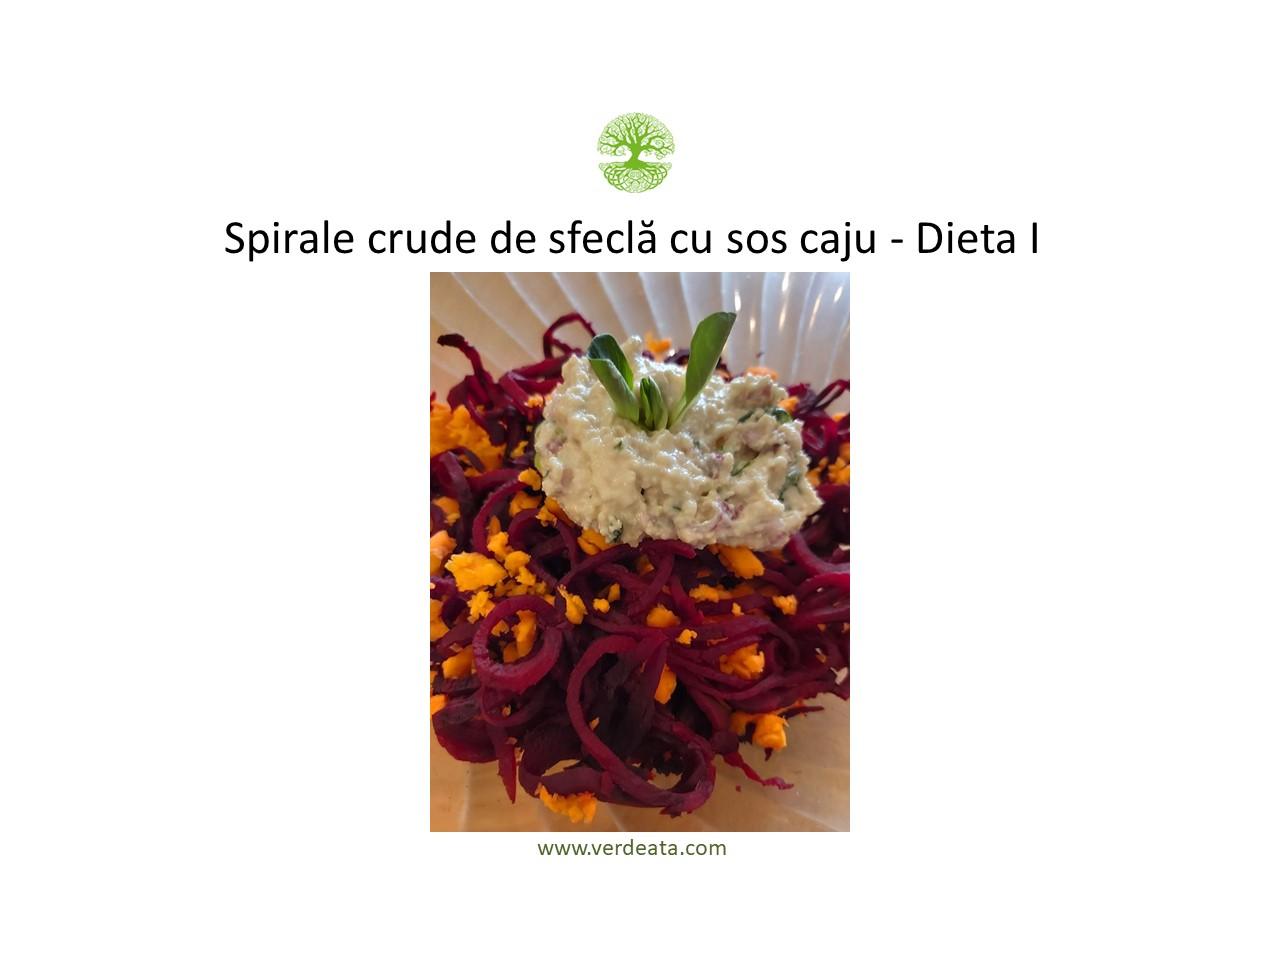 Spirale de sfecla cruda cu sos caju - Dieta I